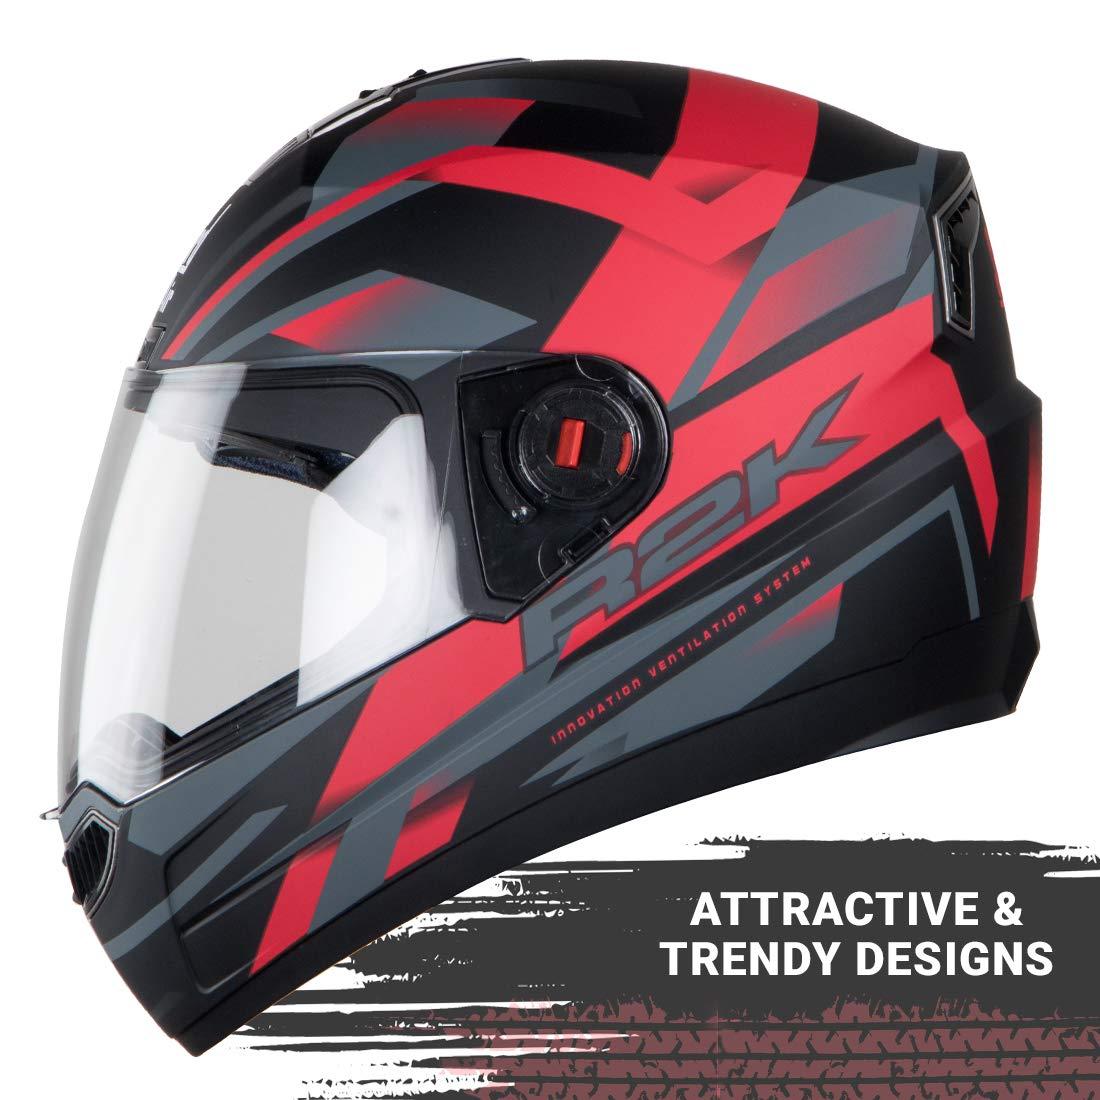 Stylish Matt Black with Red Steelbird SBA-1 R2K Full Face Graphics Helmet